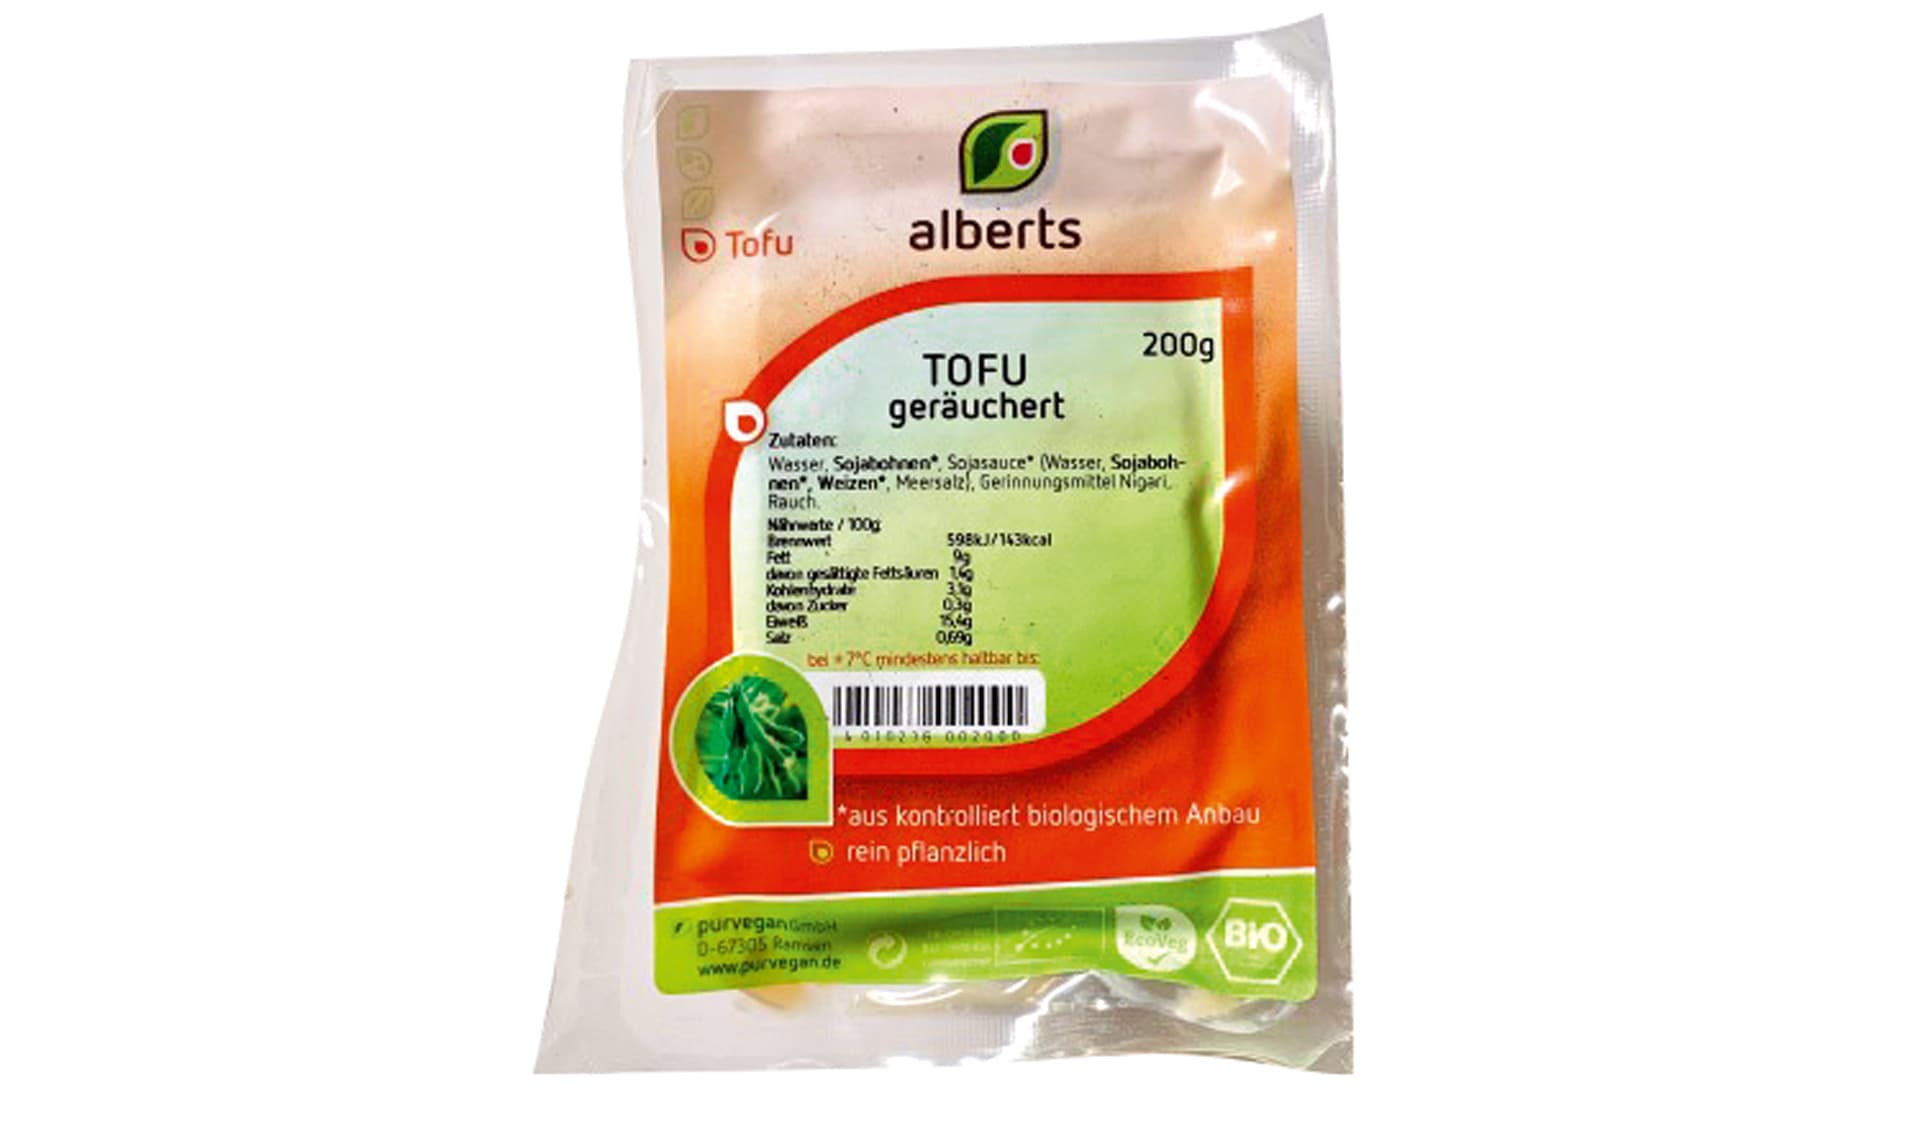 Alberts Tofu geräuchert (www.purvegan.de)